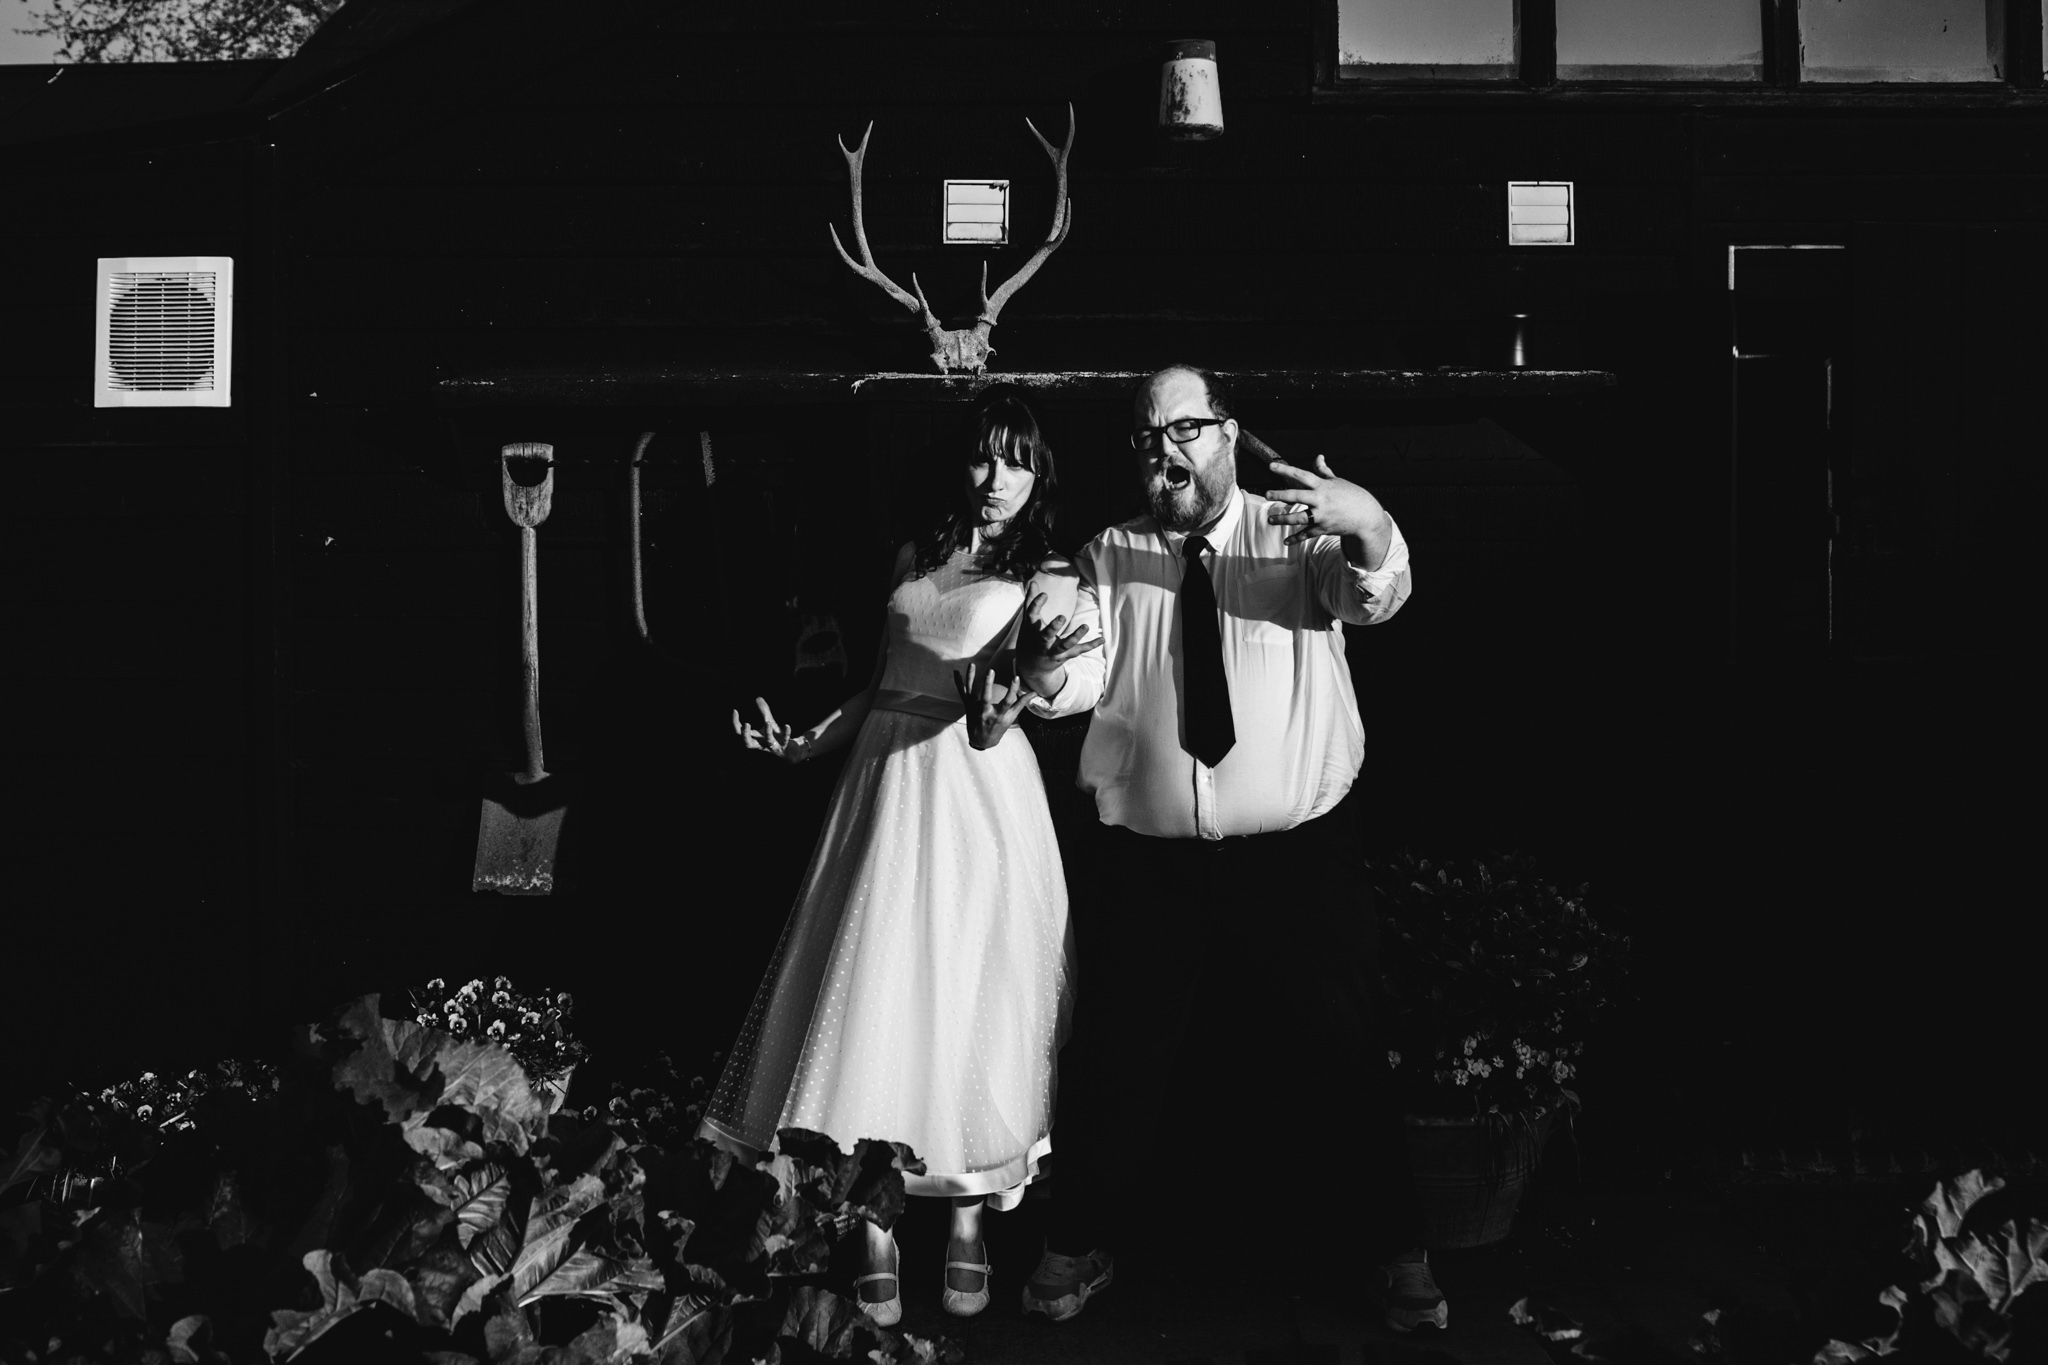 derby-wedding-photographer-camera-hannah-blog-21.jpg